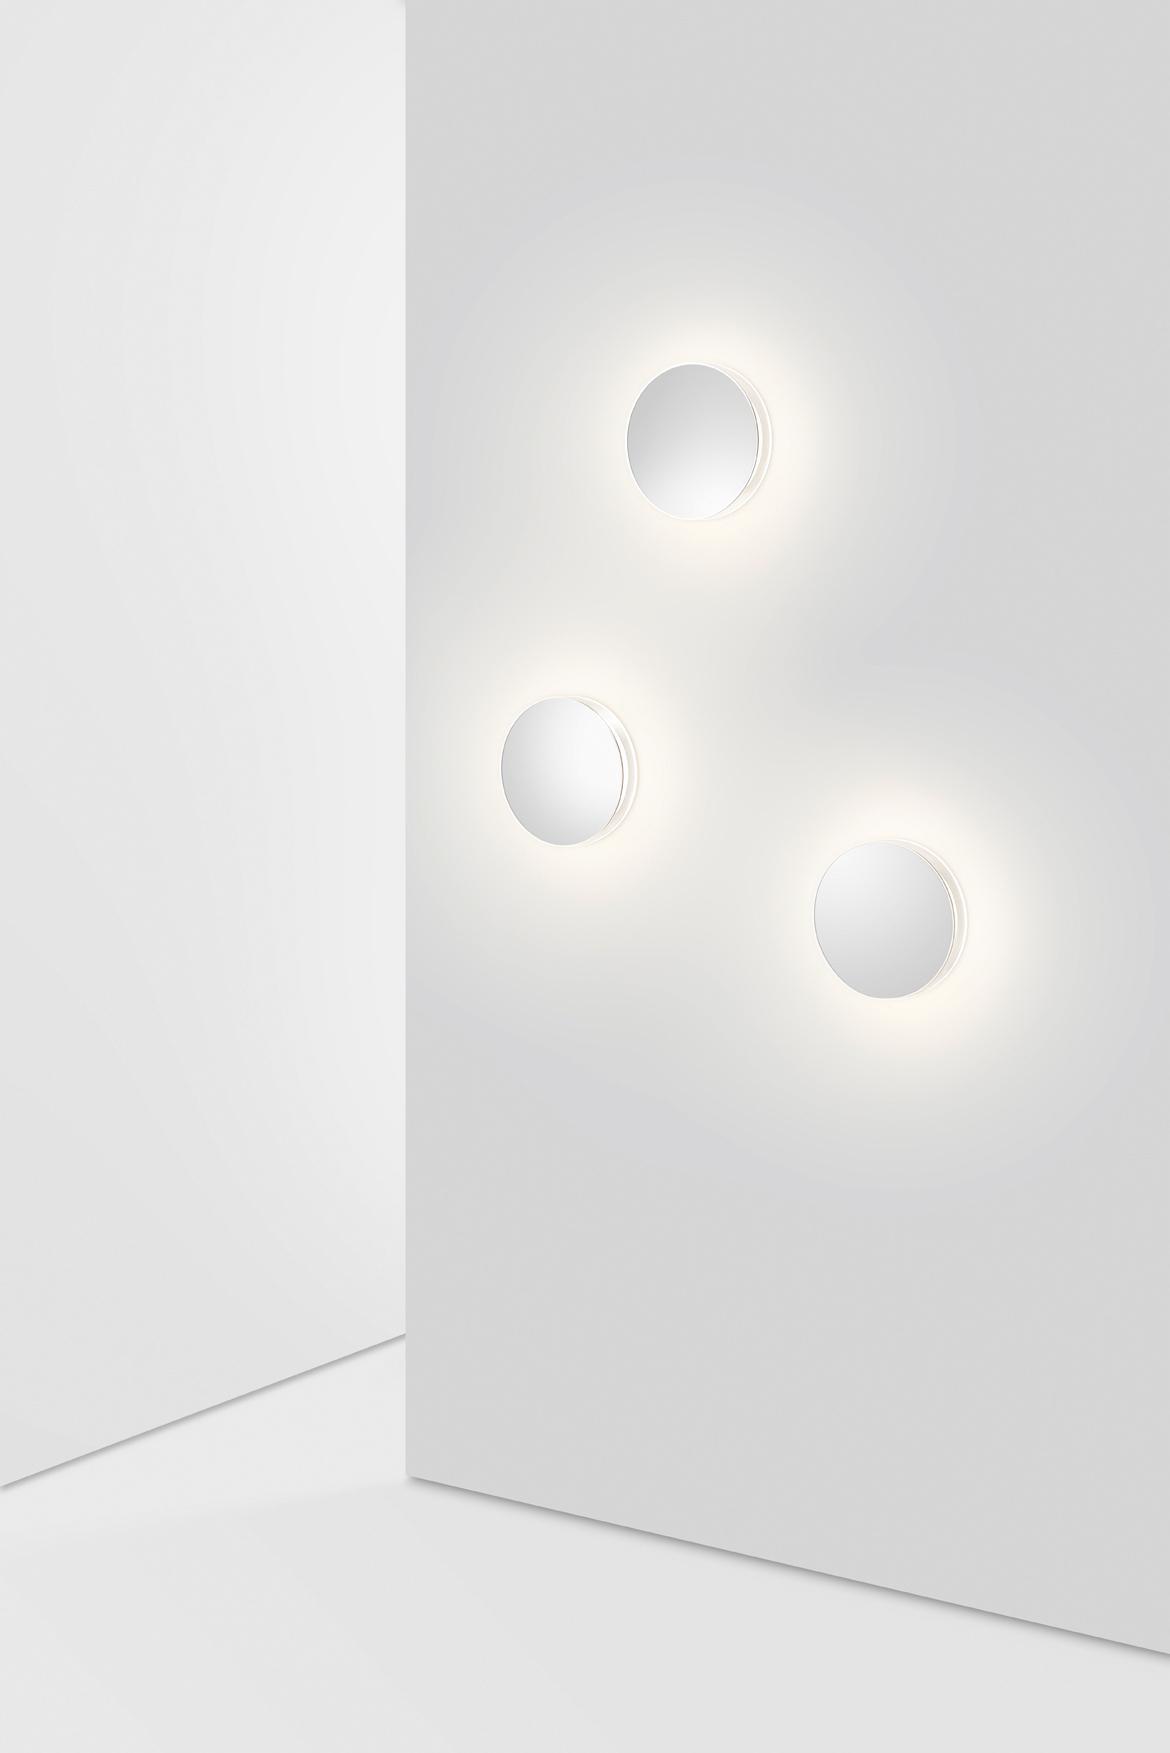 01_Lid_W_LED_mirror_glas_1170